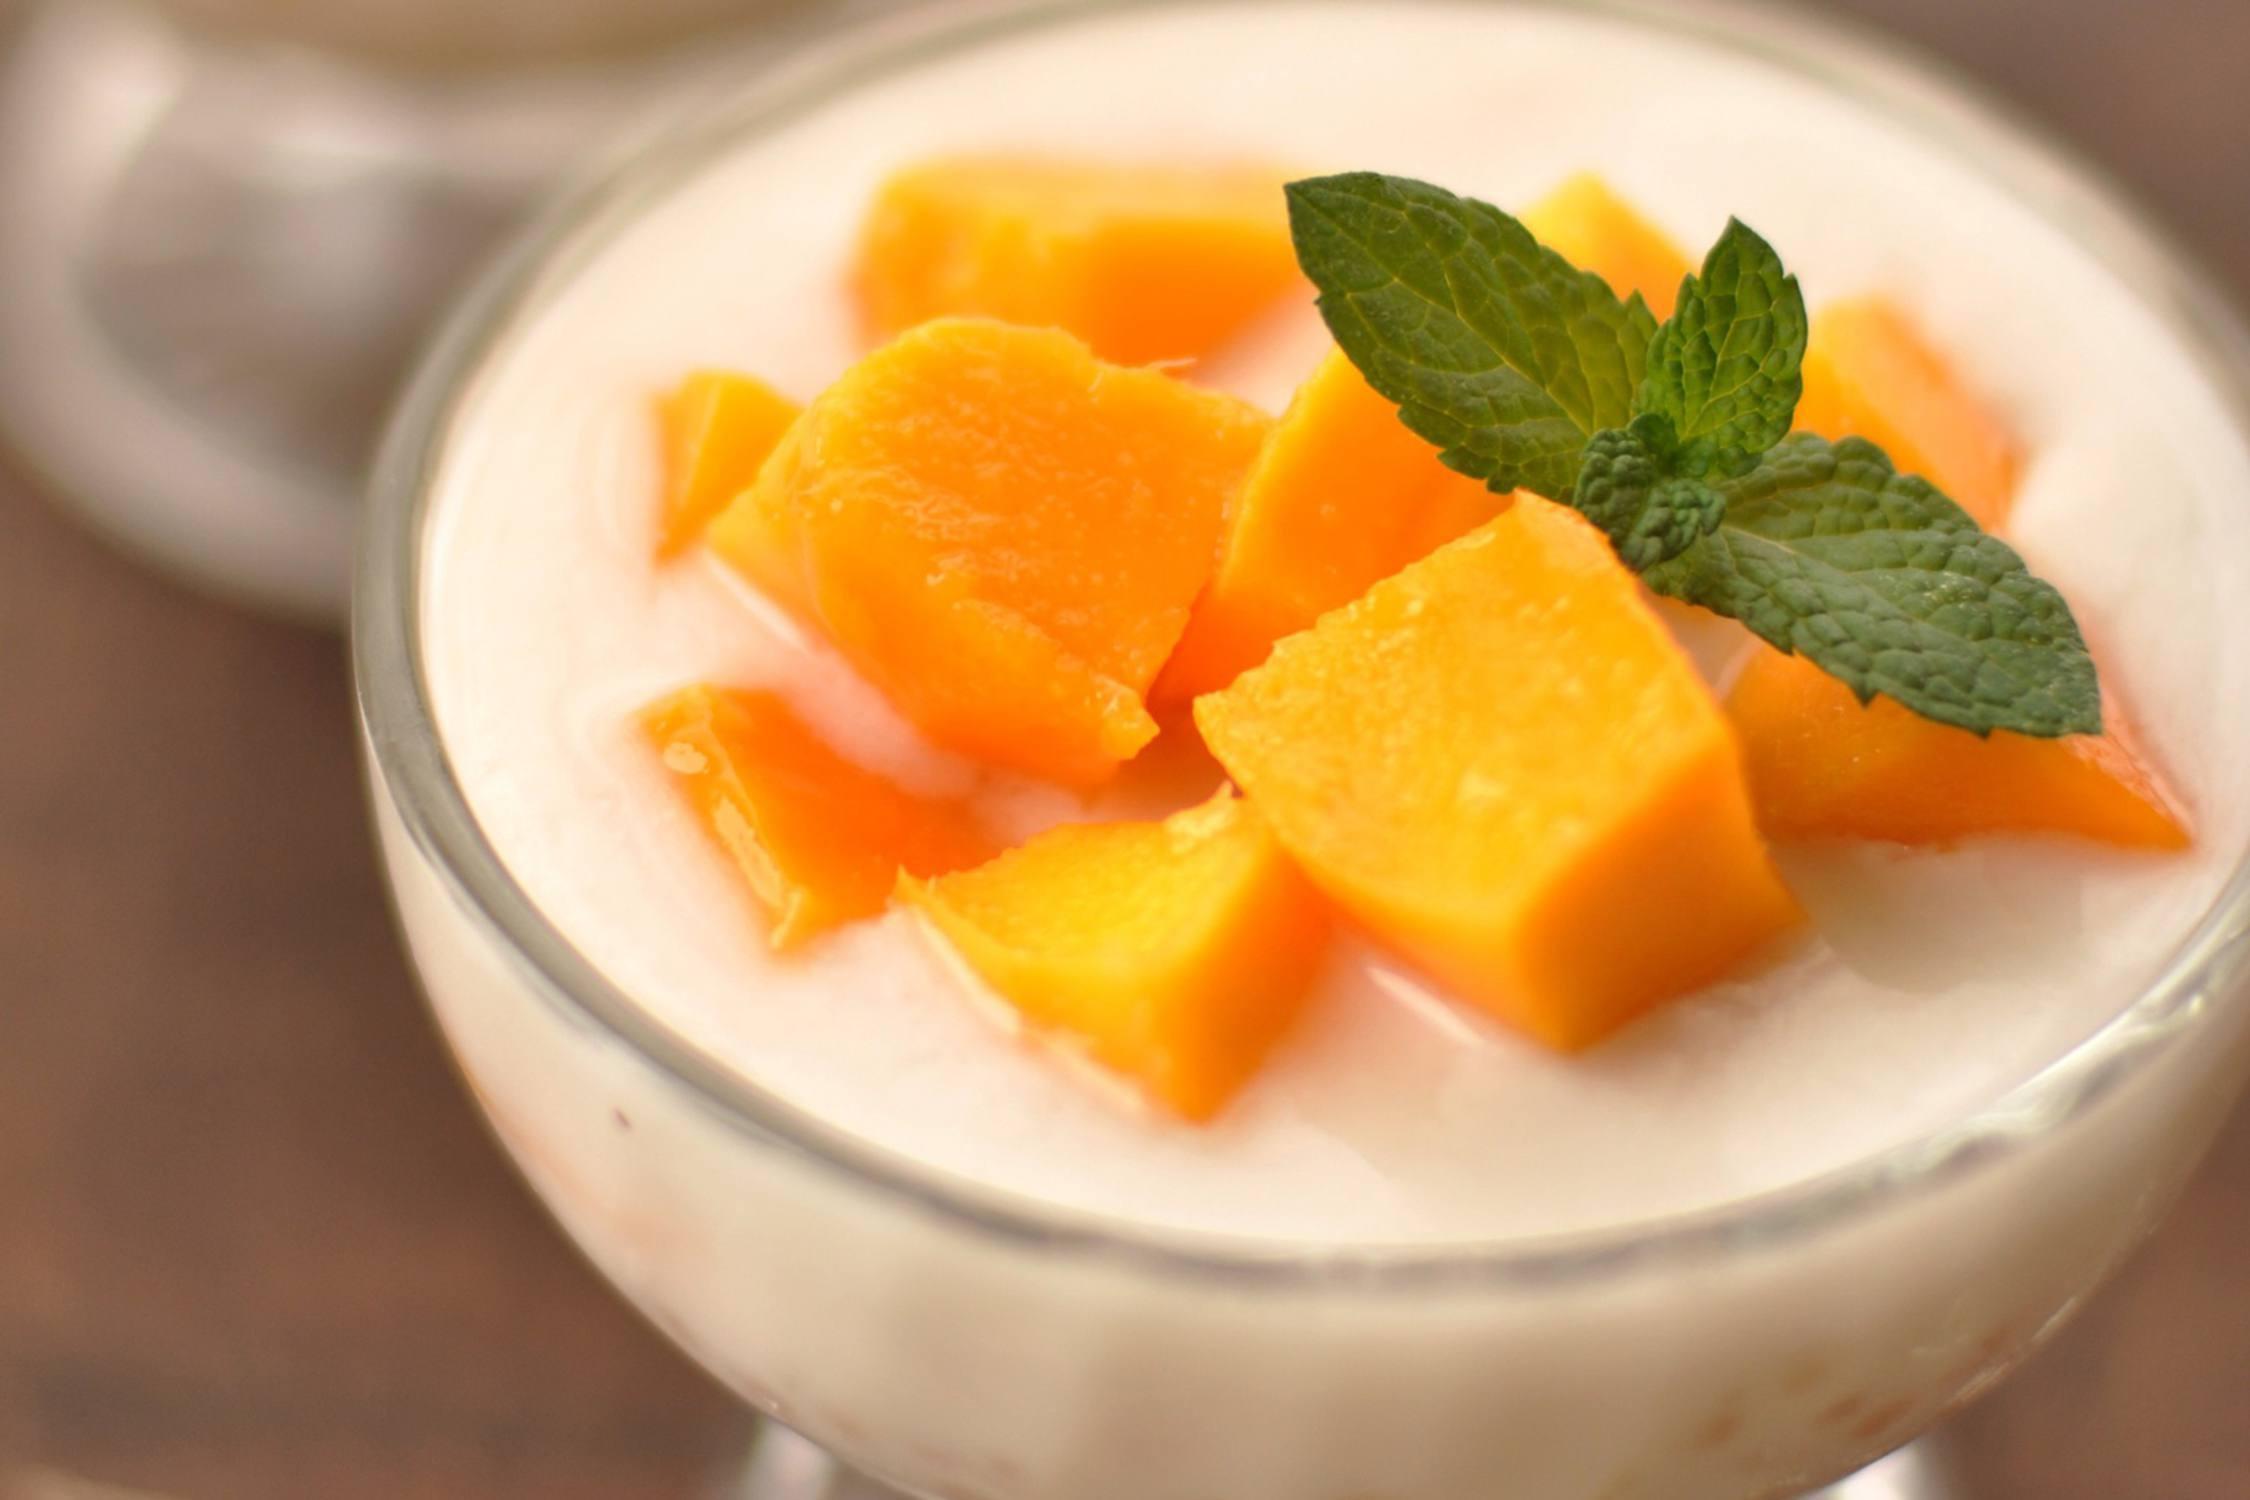 Mango and tapioca pearls